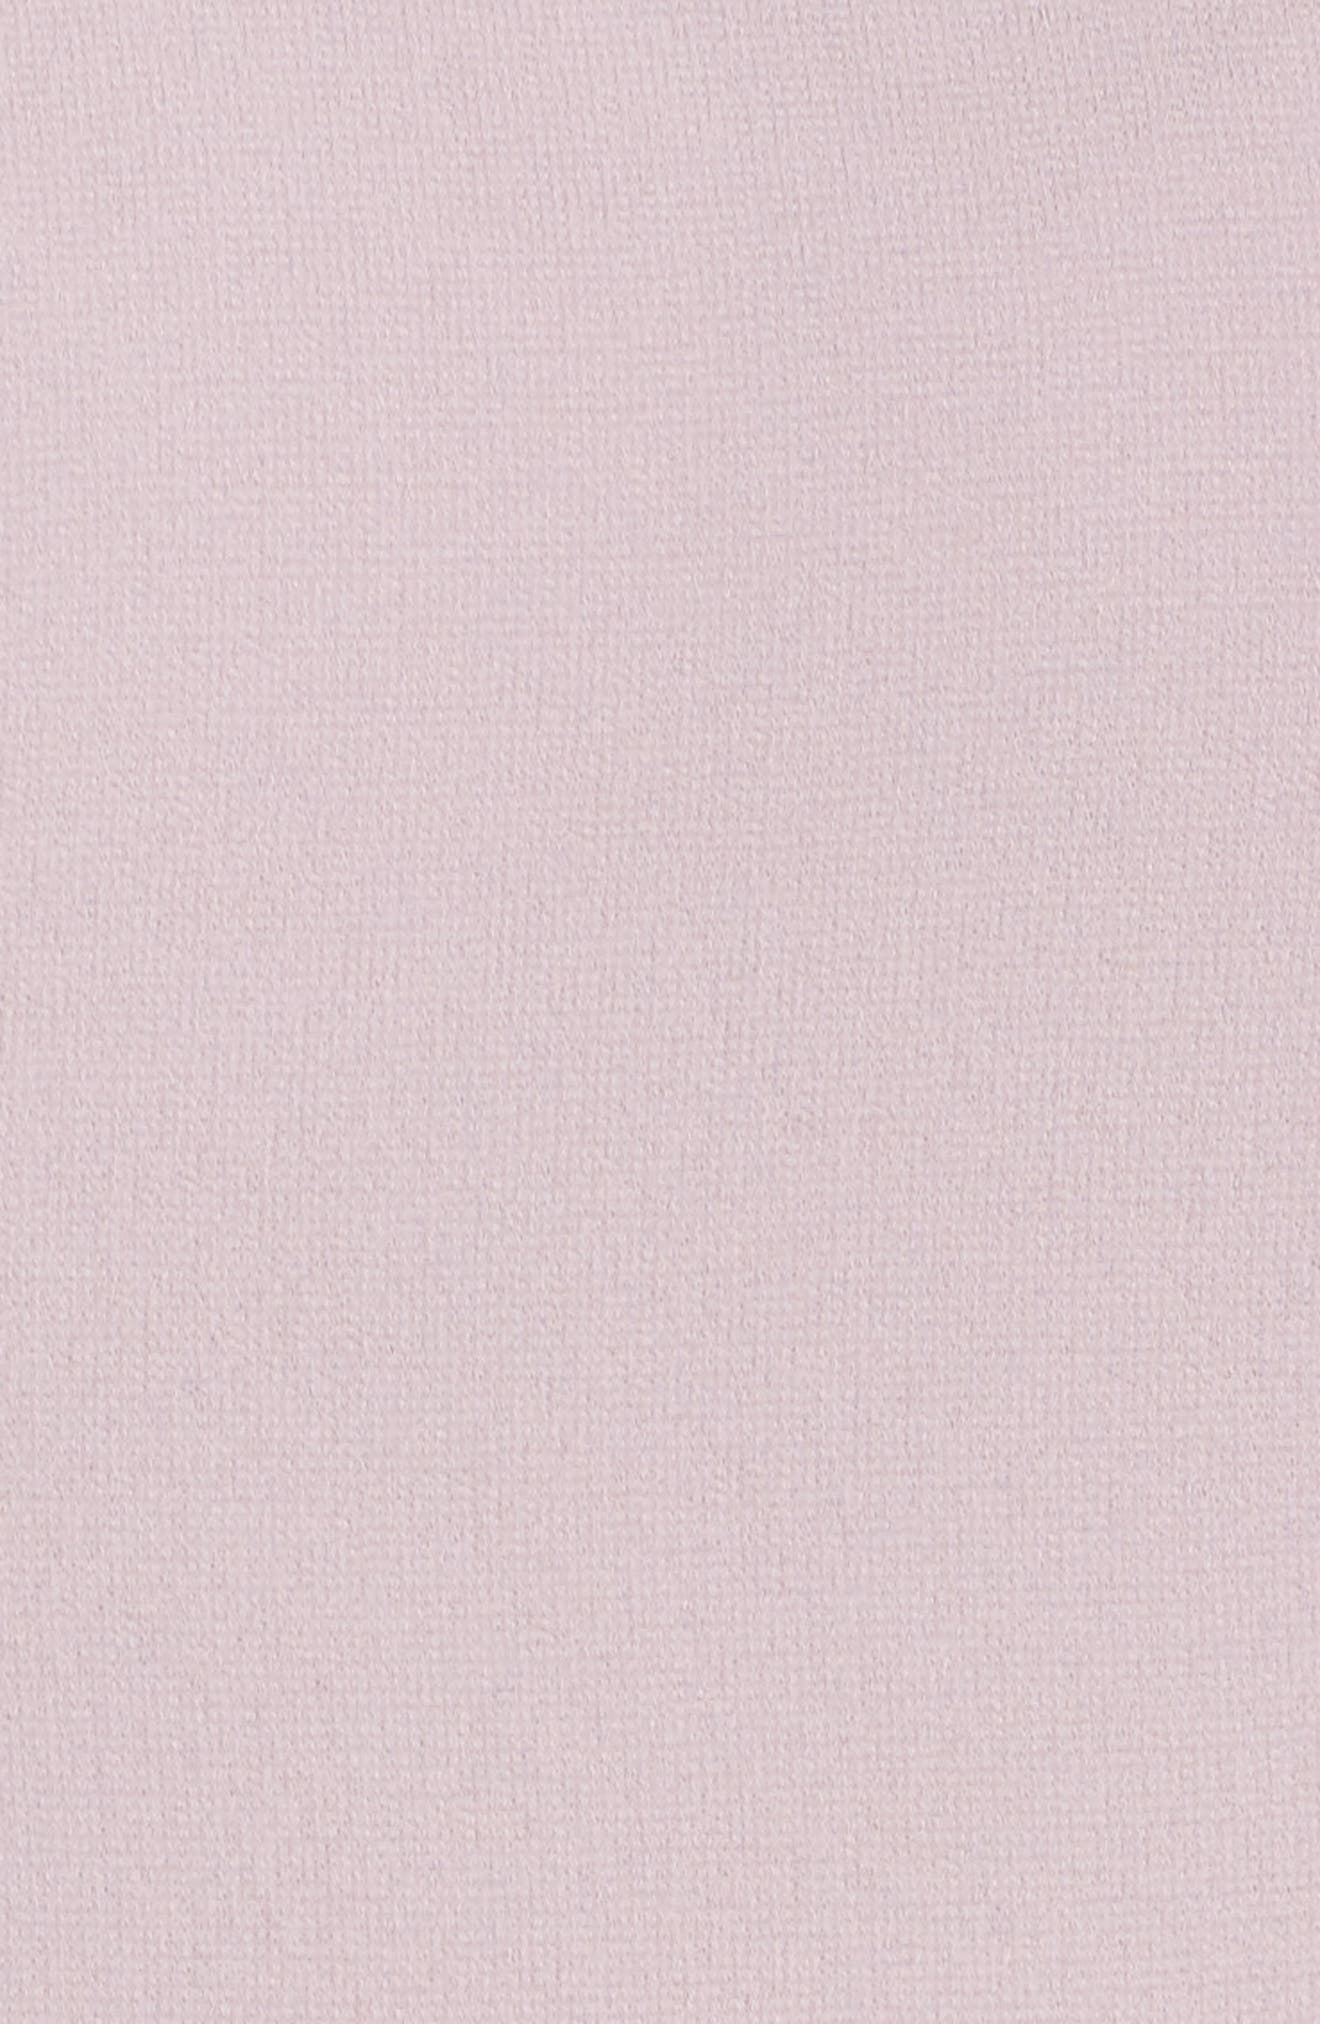 Chiffon Strapless Maxi Dress,                             Alternate thumbnail 5, color,                             020